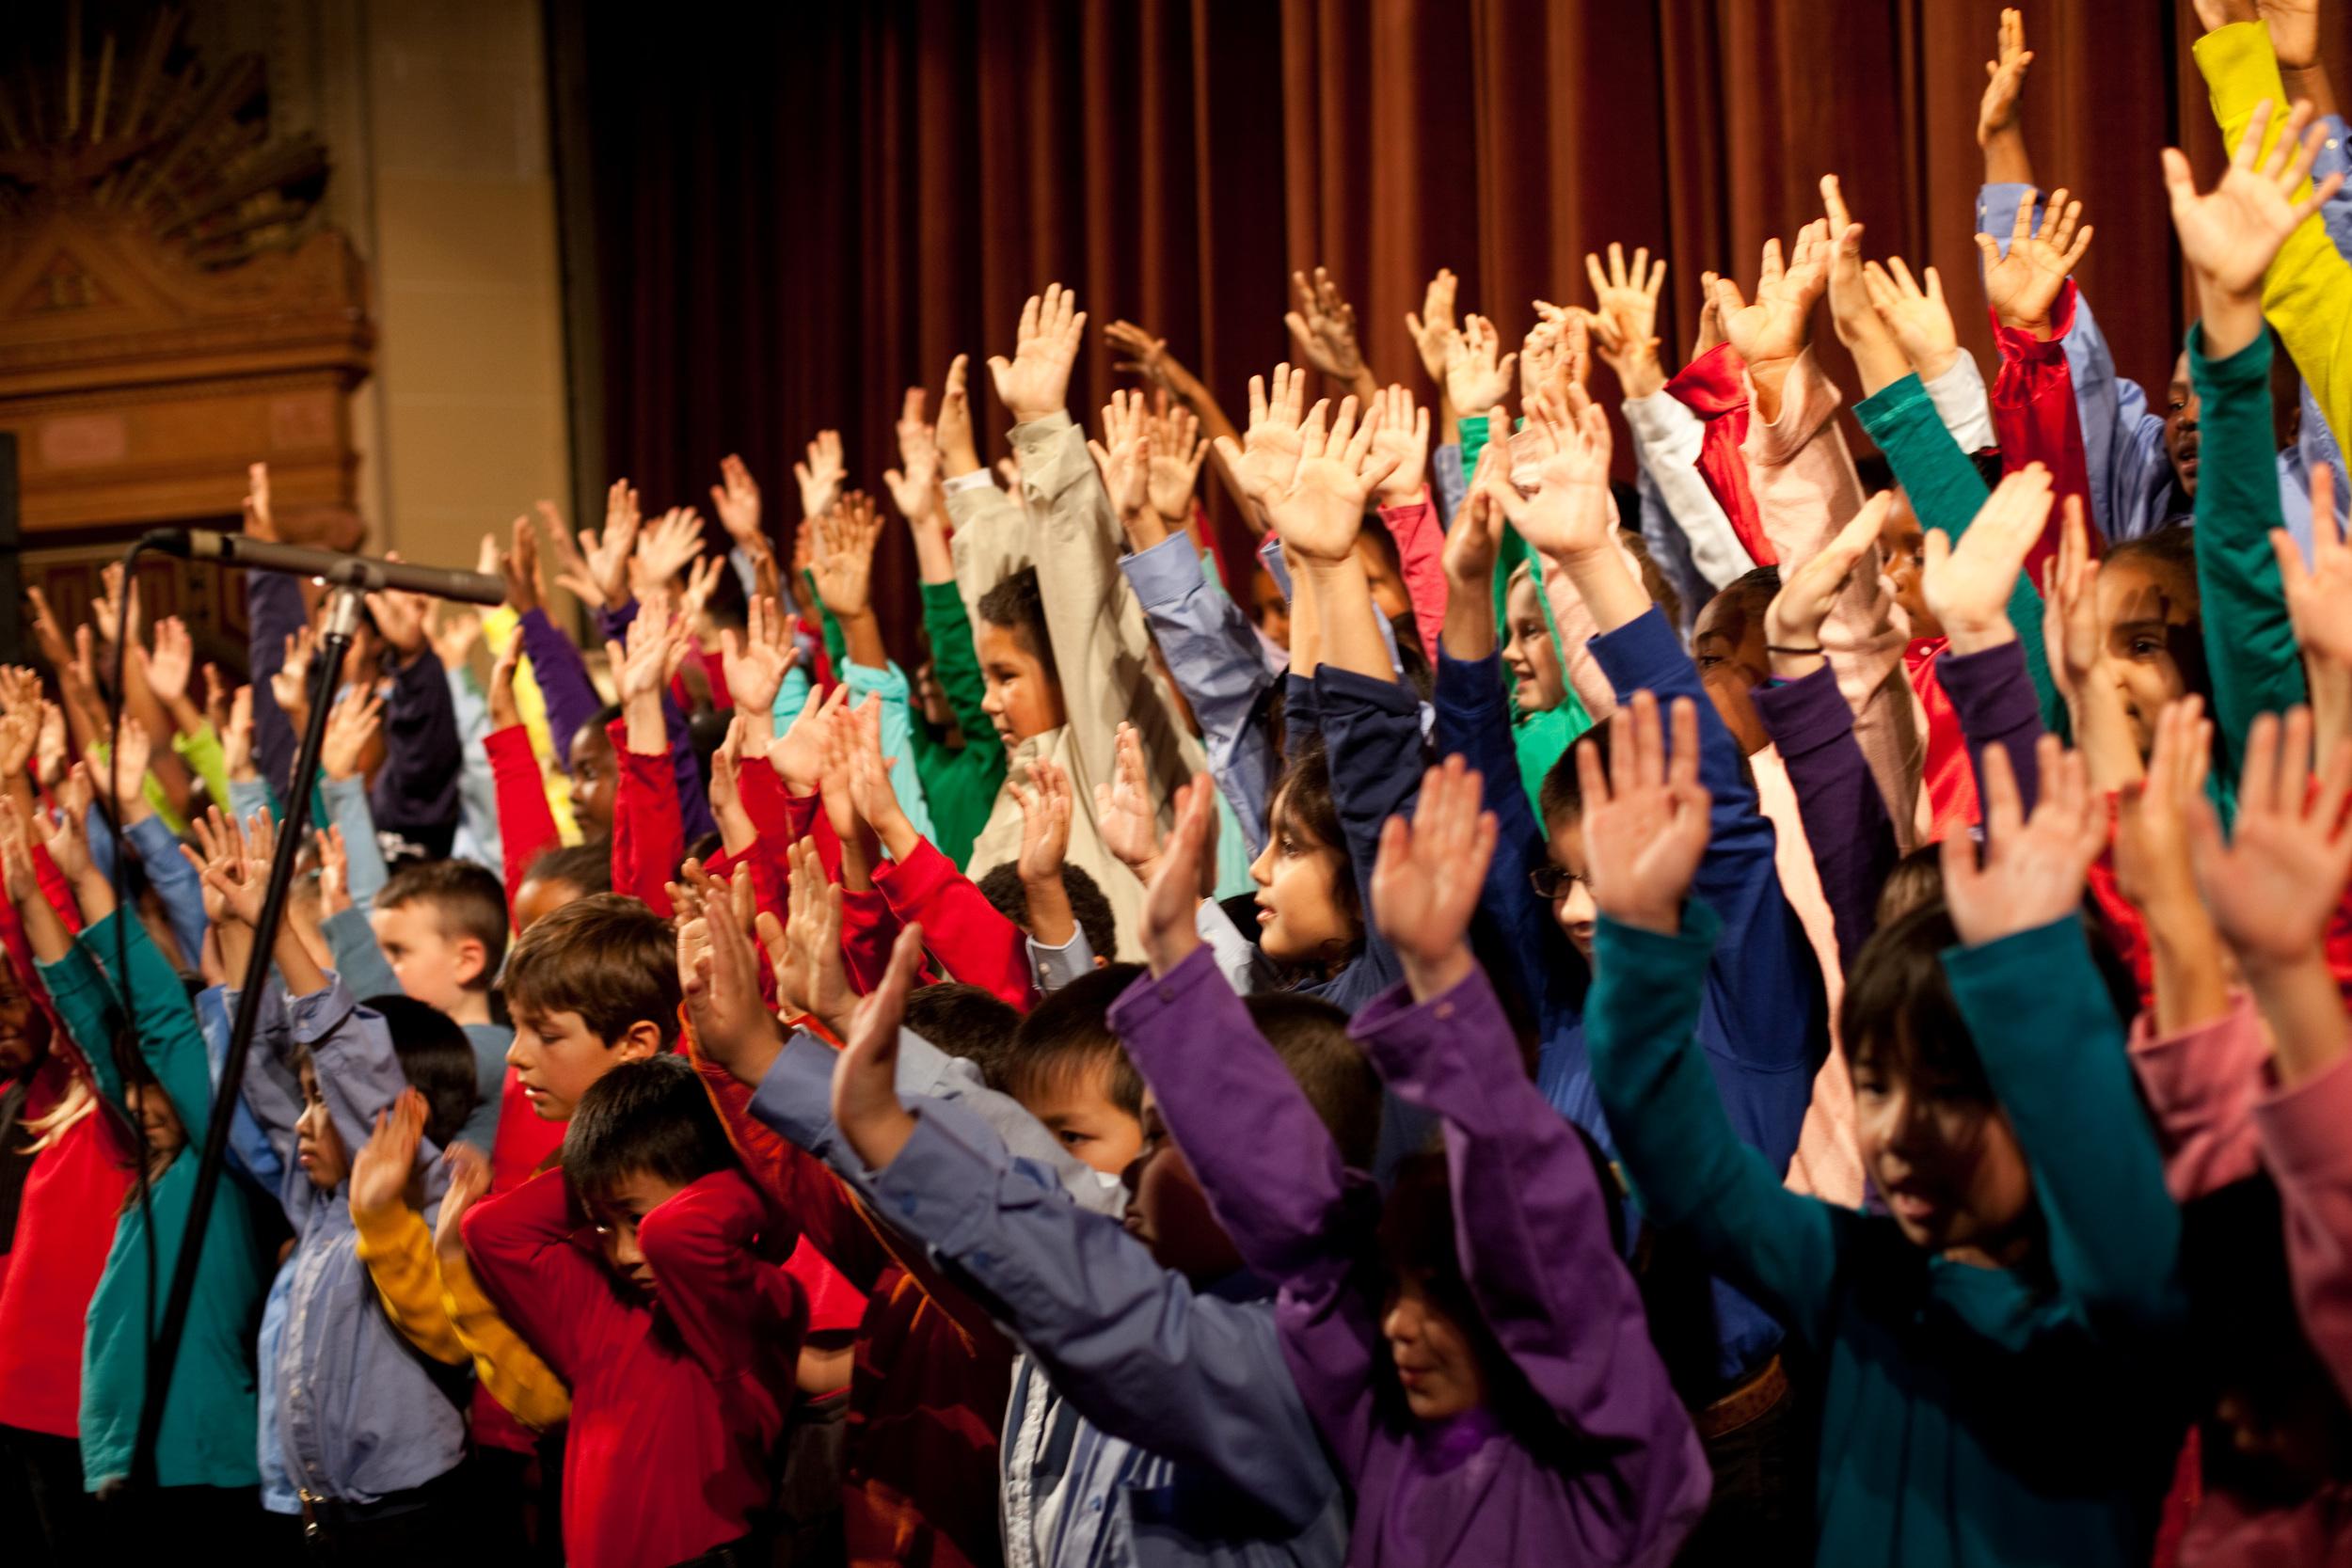 Oakland Children's Community Choir